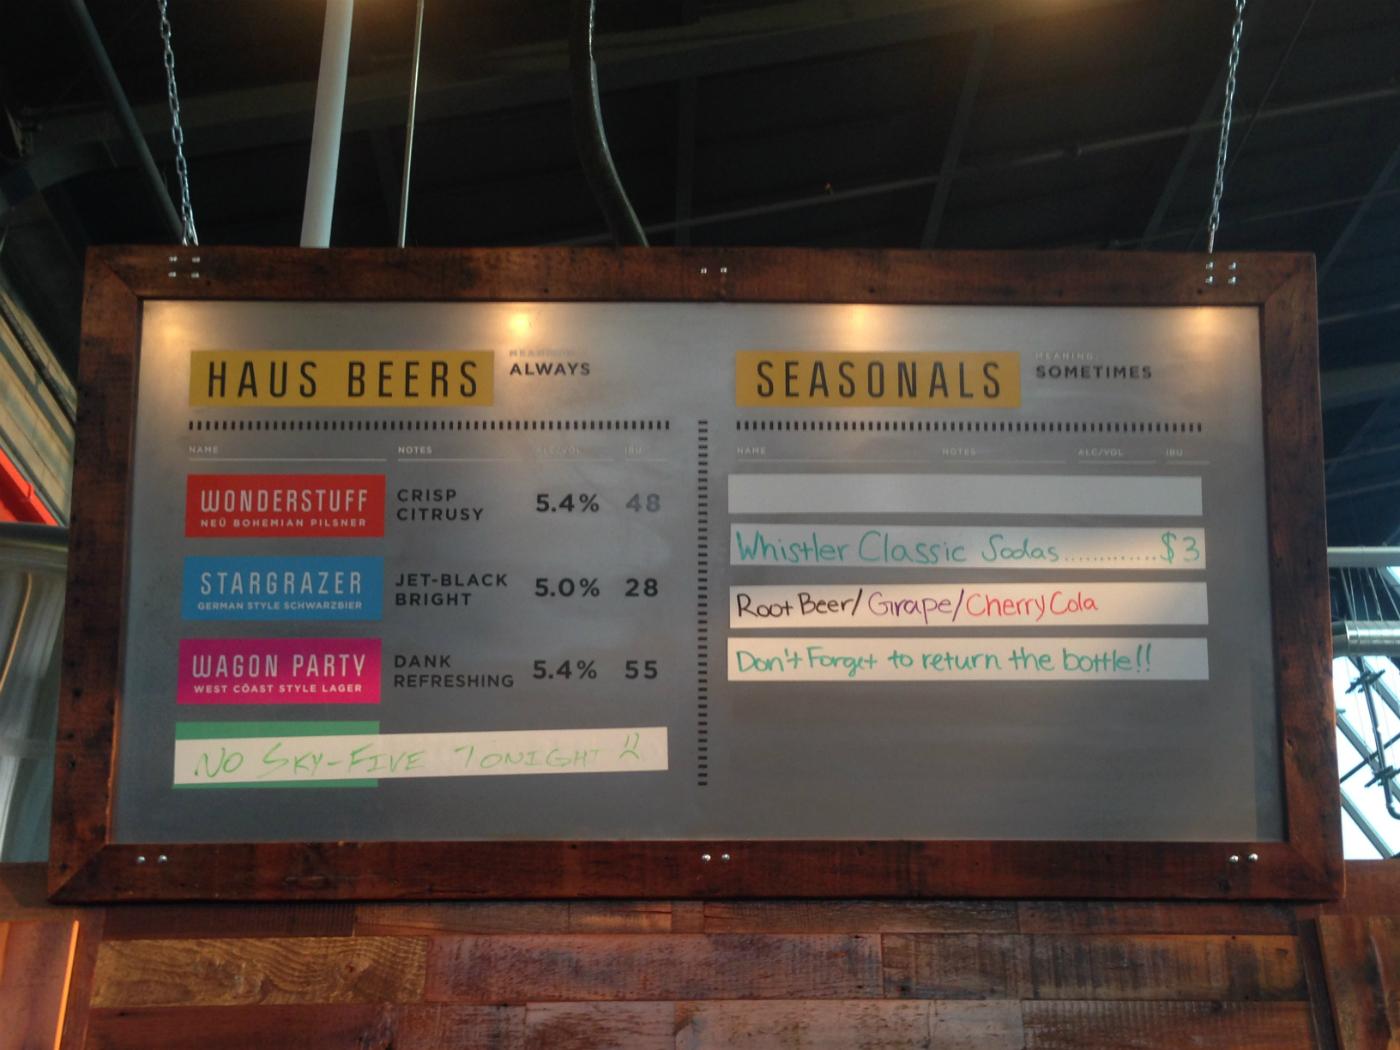 bauhaus Brew Labs taproom board